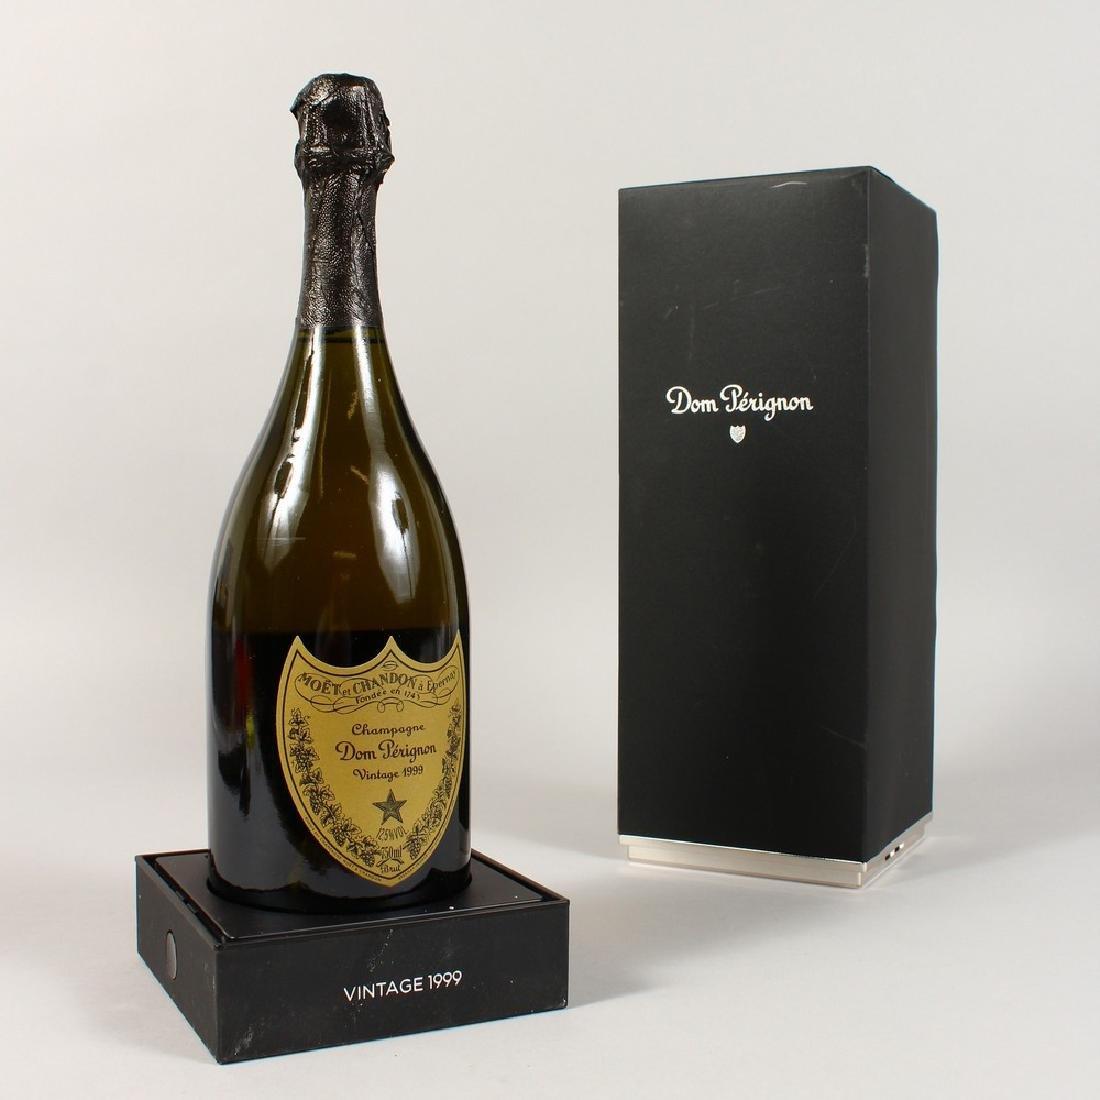 DOM PERIGNON, 1999, One Bottle, boxed.